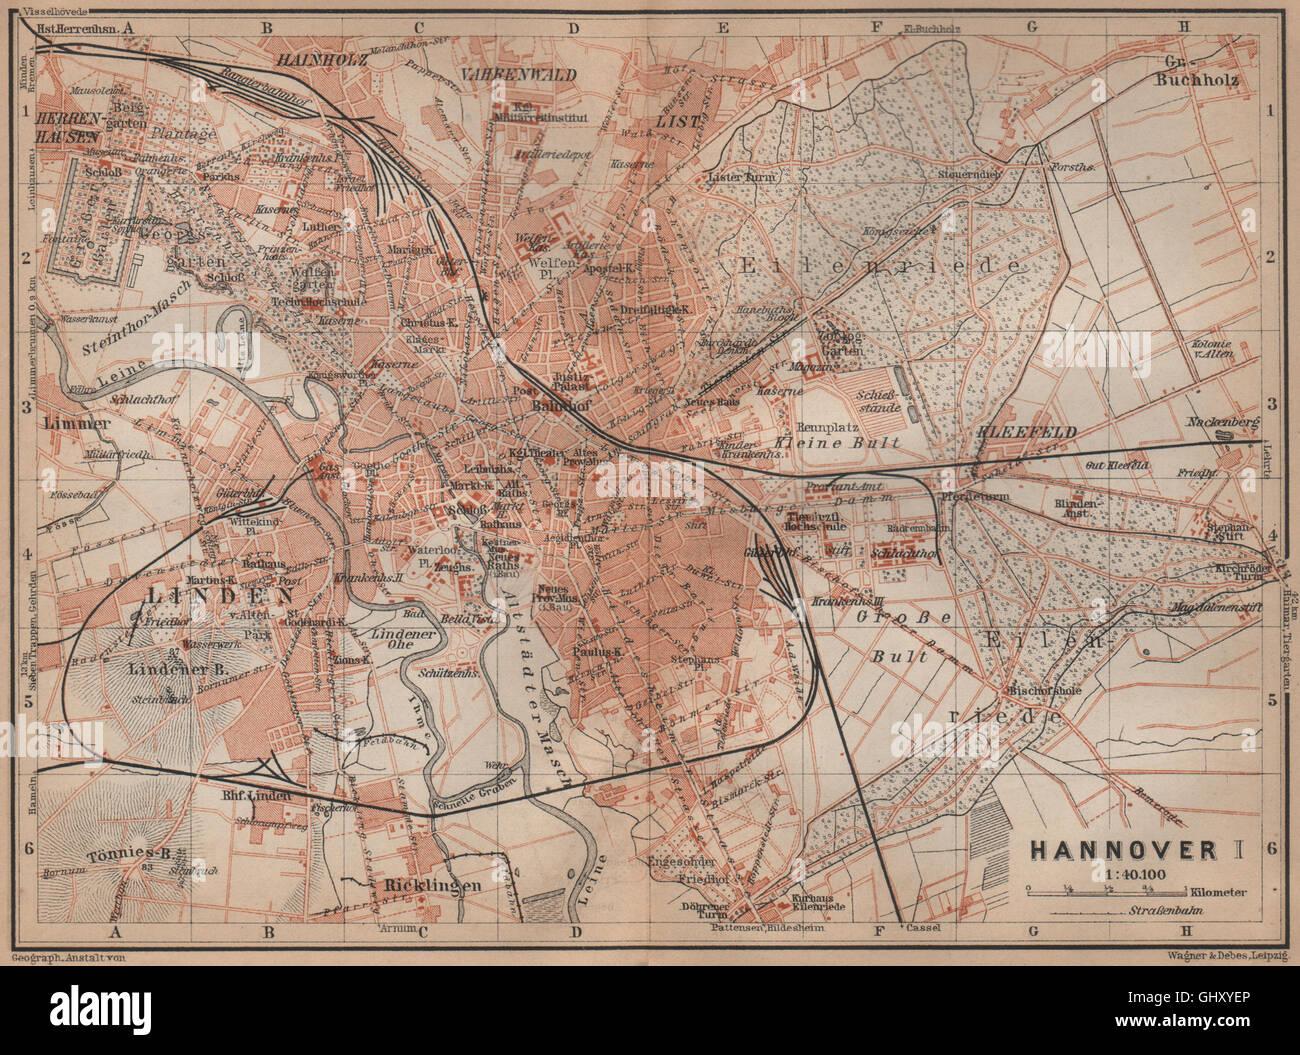 HANNOVER antique town city stadtplan I Hanover Lower Saxony karte